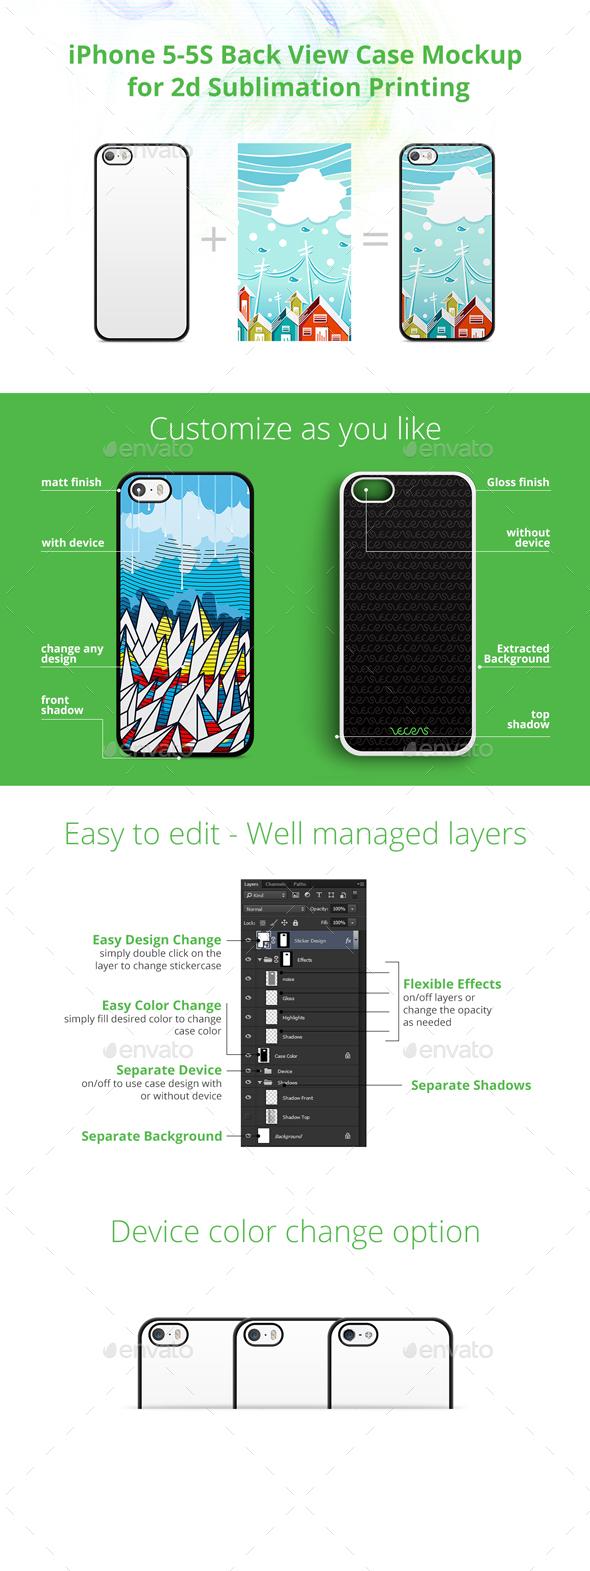 iPhone 5-5s Case Design Mockup for 2d Sublimation Printing - Back View - Mobile Displays